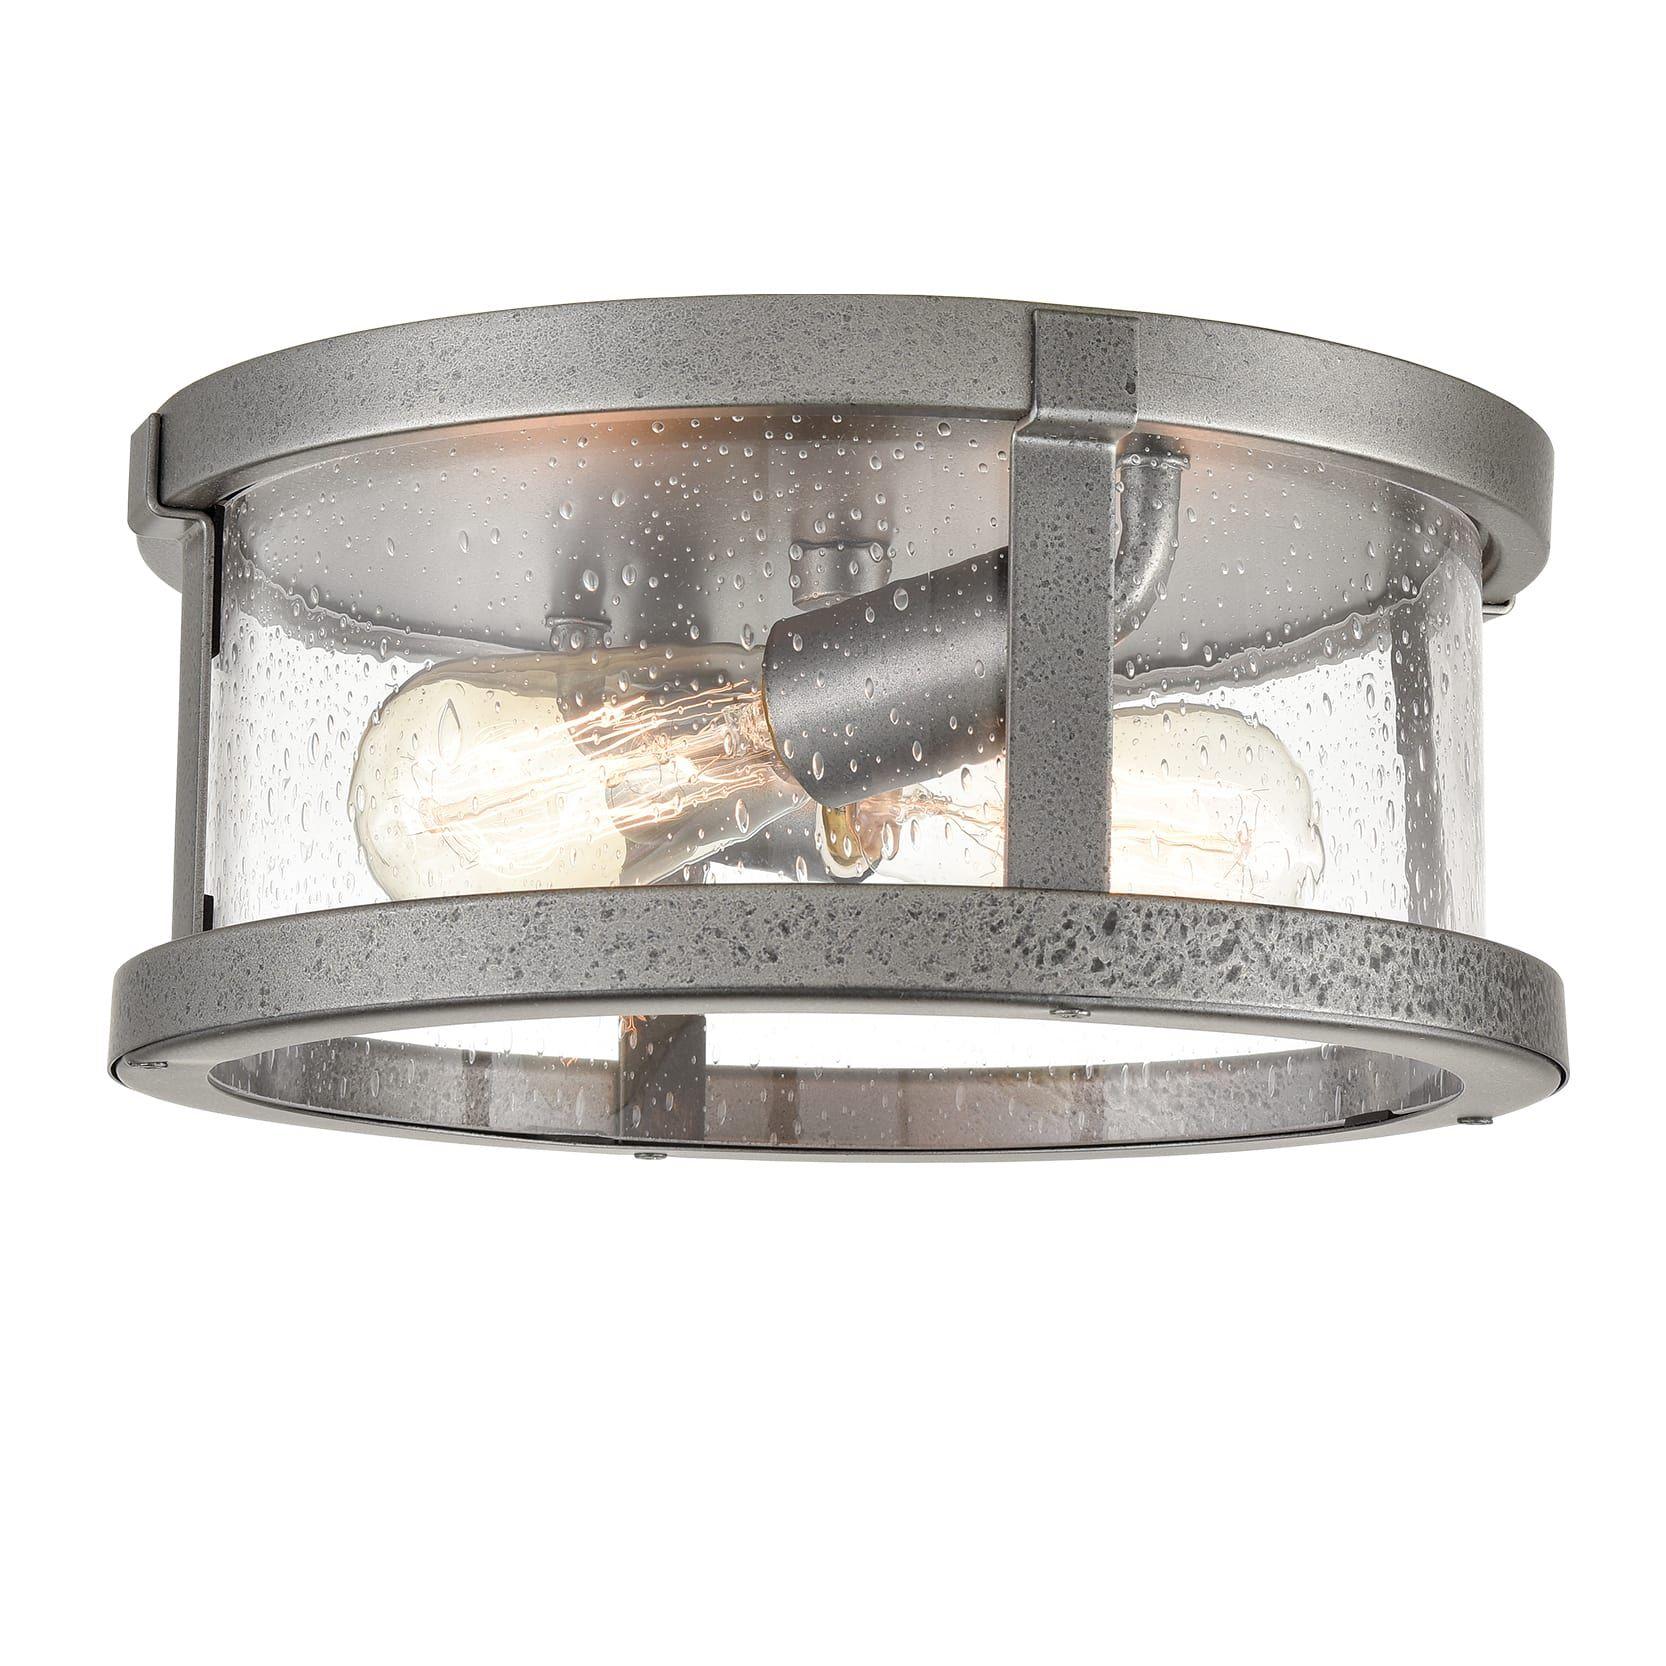 Farmhouse Drum Flush Mount Ceiling Light Seeded Glass Shade In 2021 Flush Mount Ceiling Lights Ceiling Lights Seeded Glass